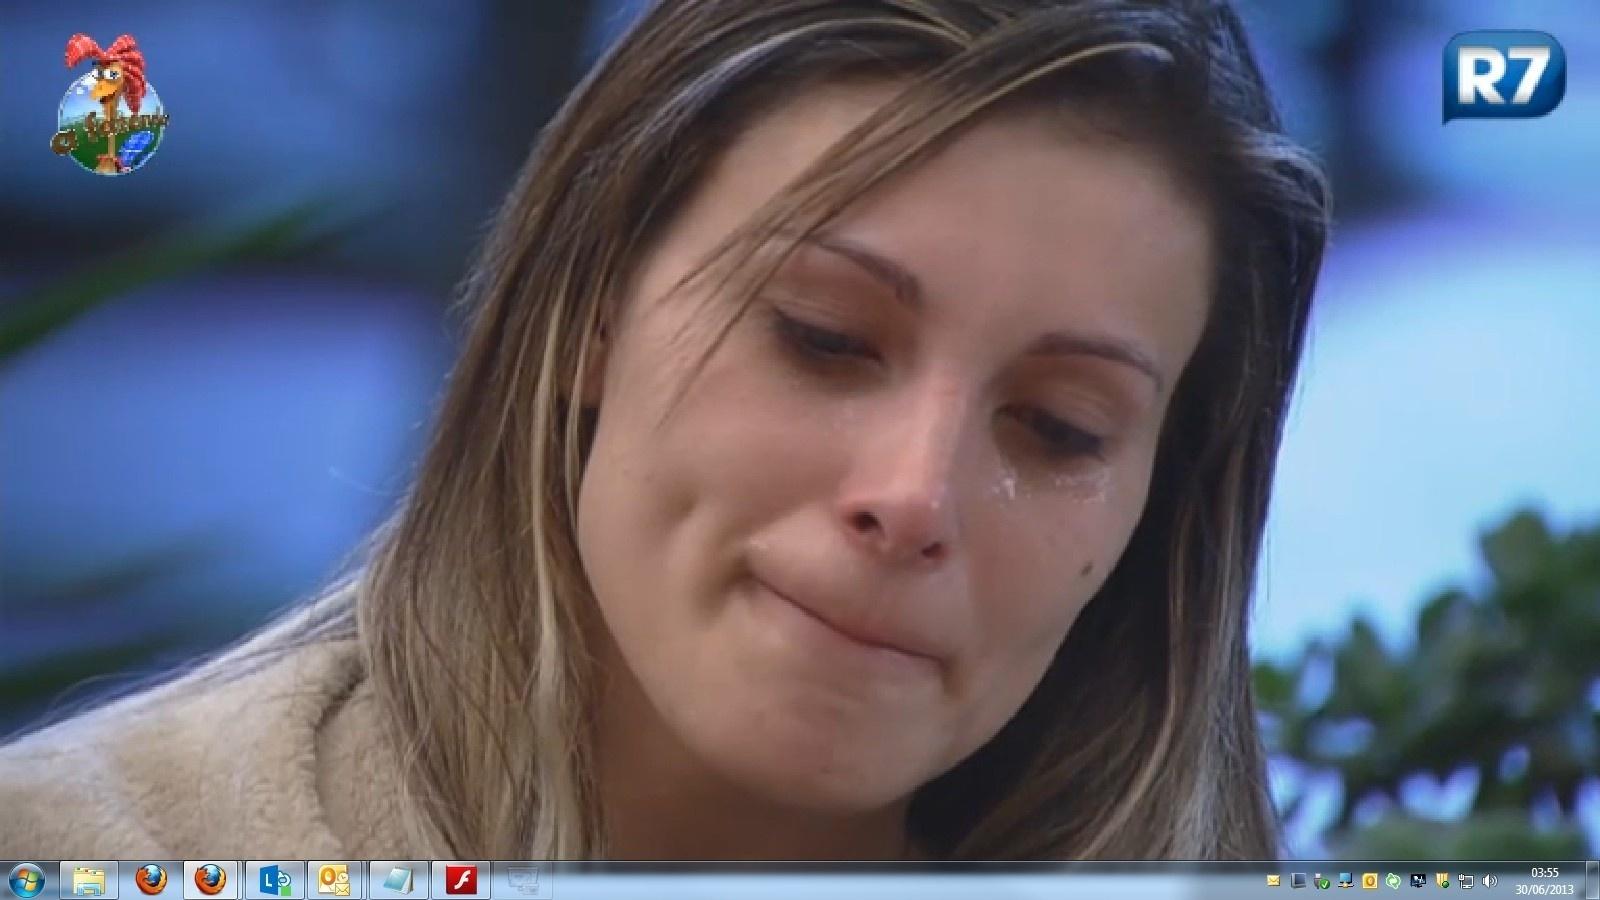 30.jun.2013 - Após ser indicada para roça, Andressa perde sono e chora